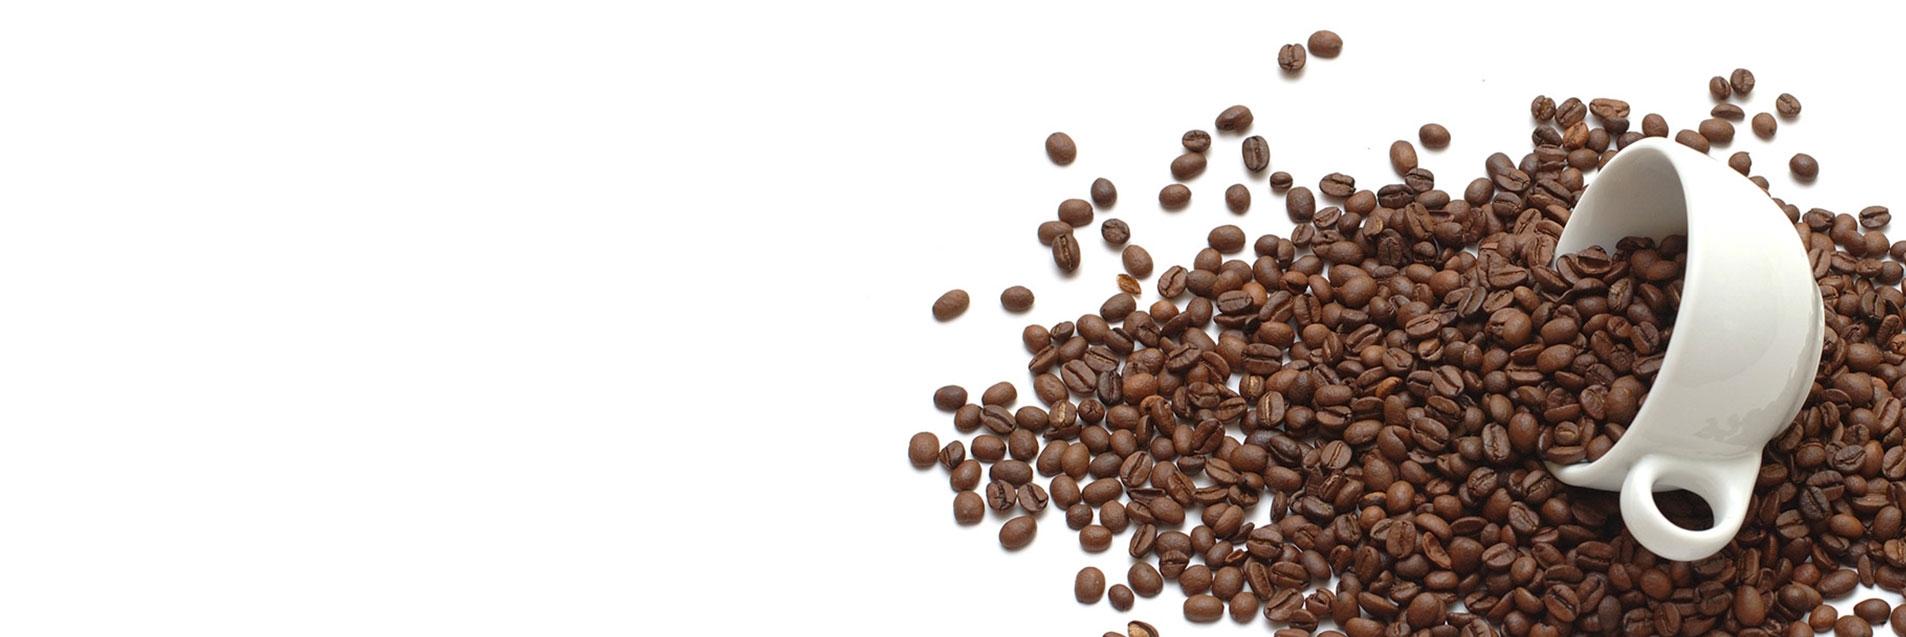 Cafea verde - Cafea HORE (@cafeaverdecafeahoreca) Cover Image